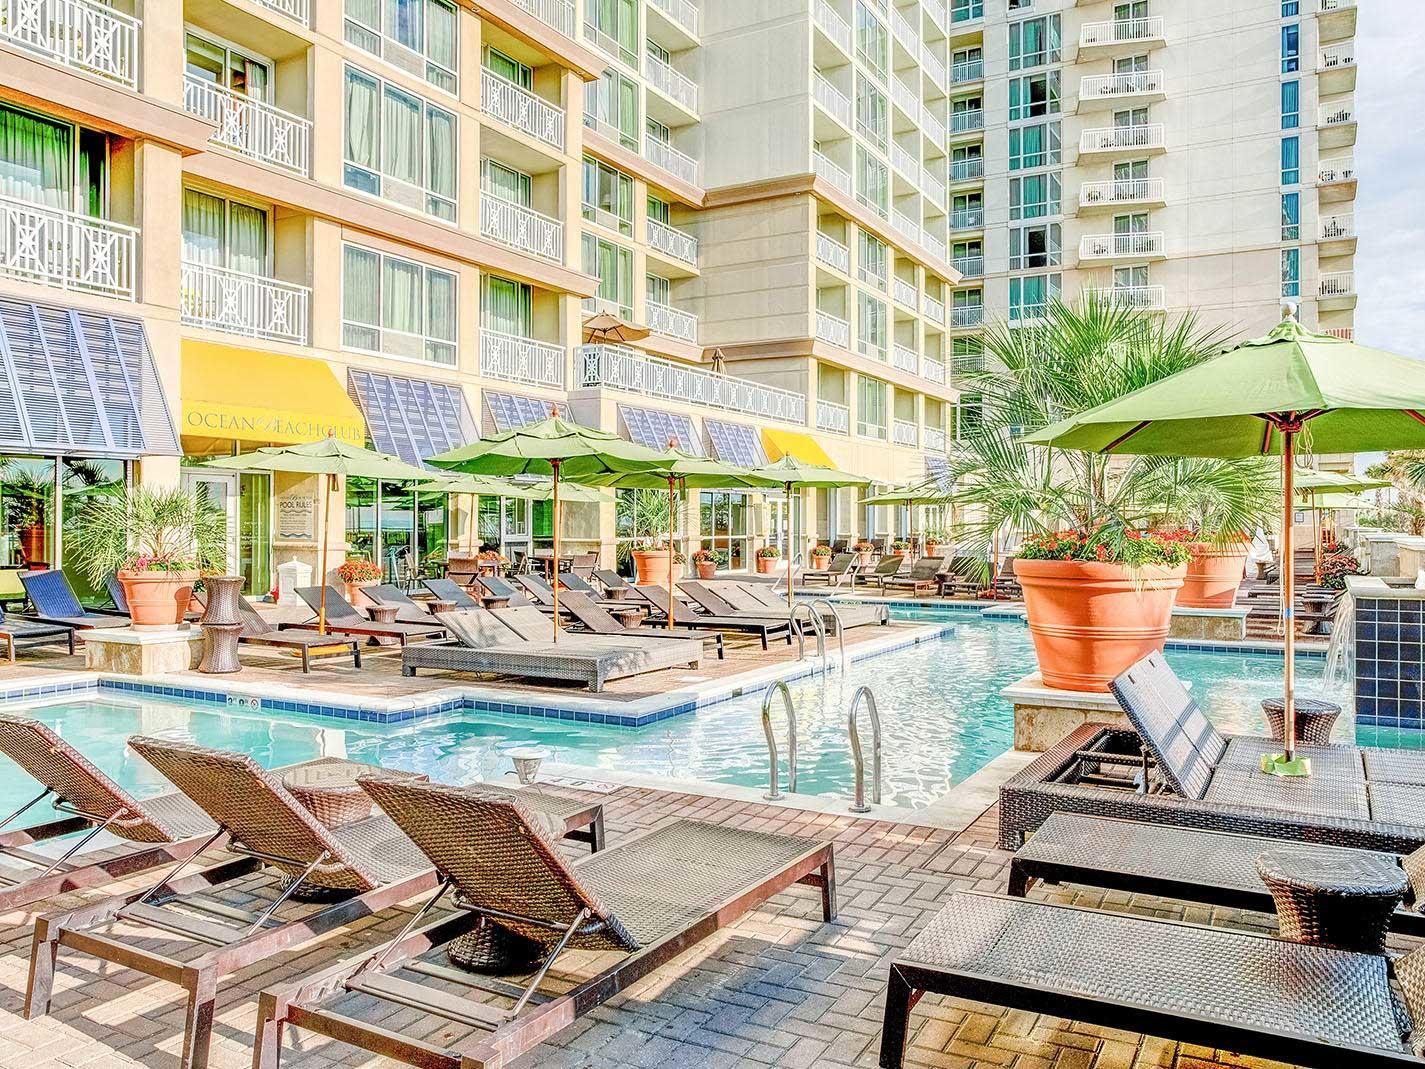 Ocean Beach Club - Luxury Family Resorts in Virginia Beach